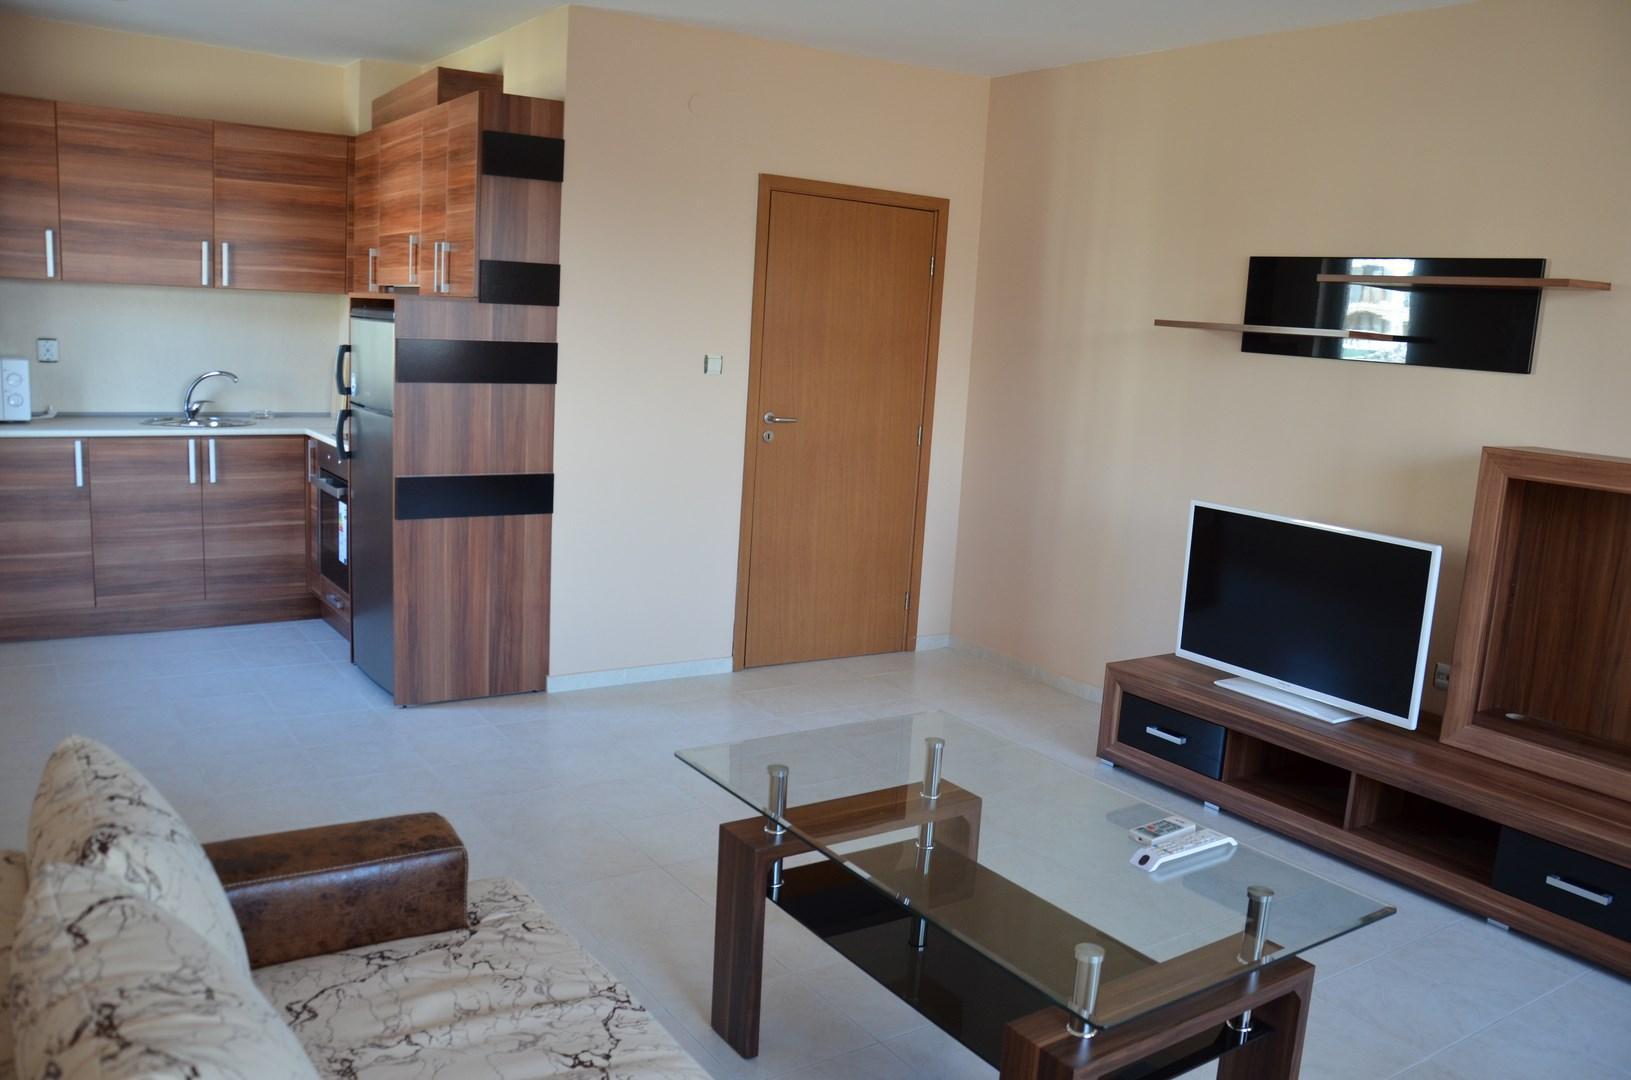 Болгария город святой влас аренда 1 комнатная квартира